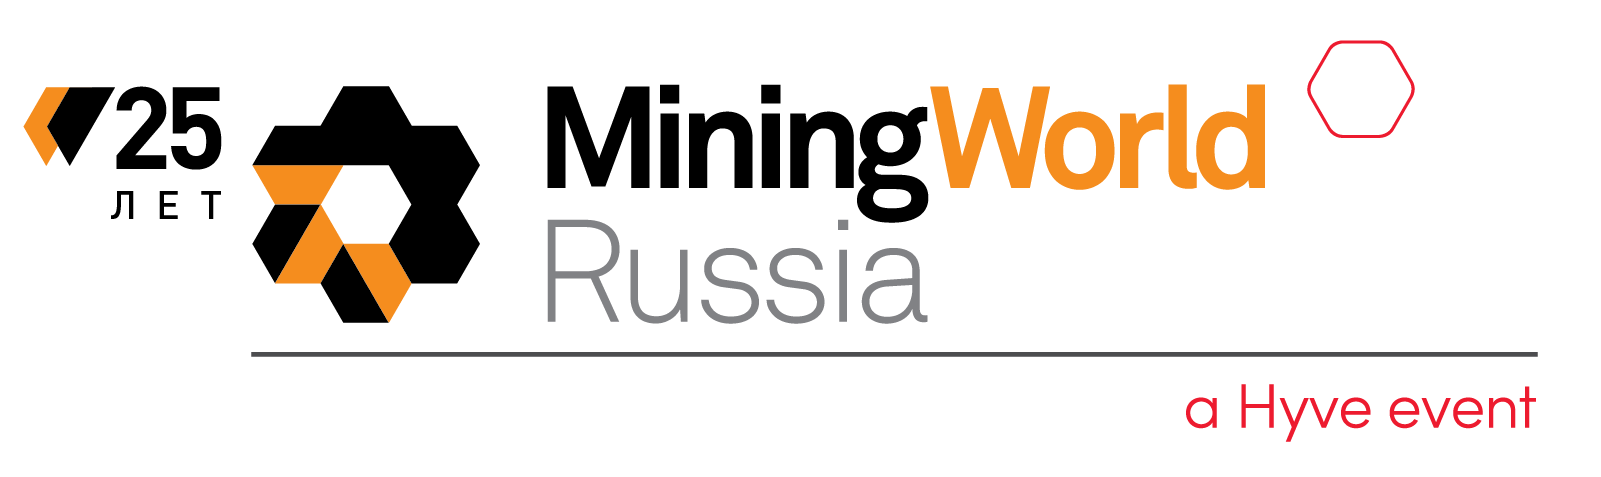 (c) Miningworld.ru